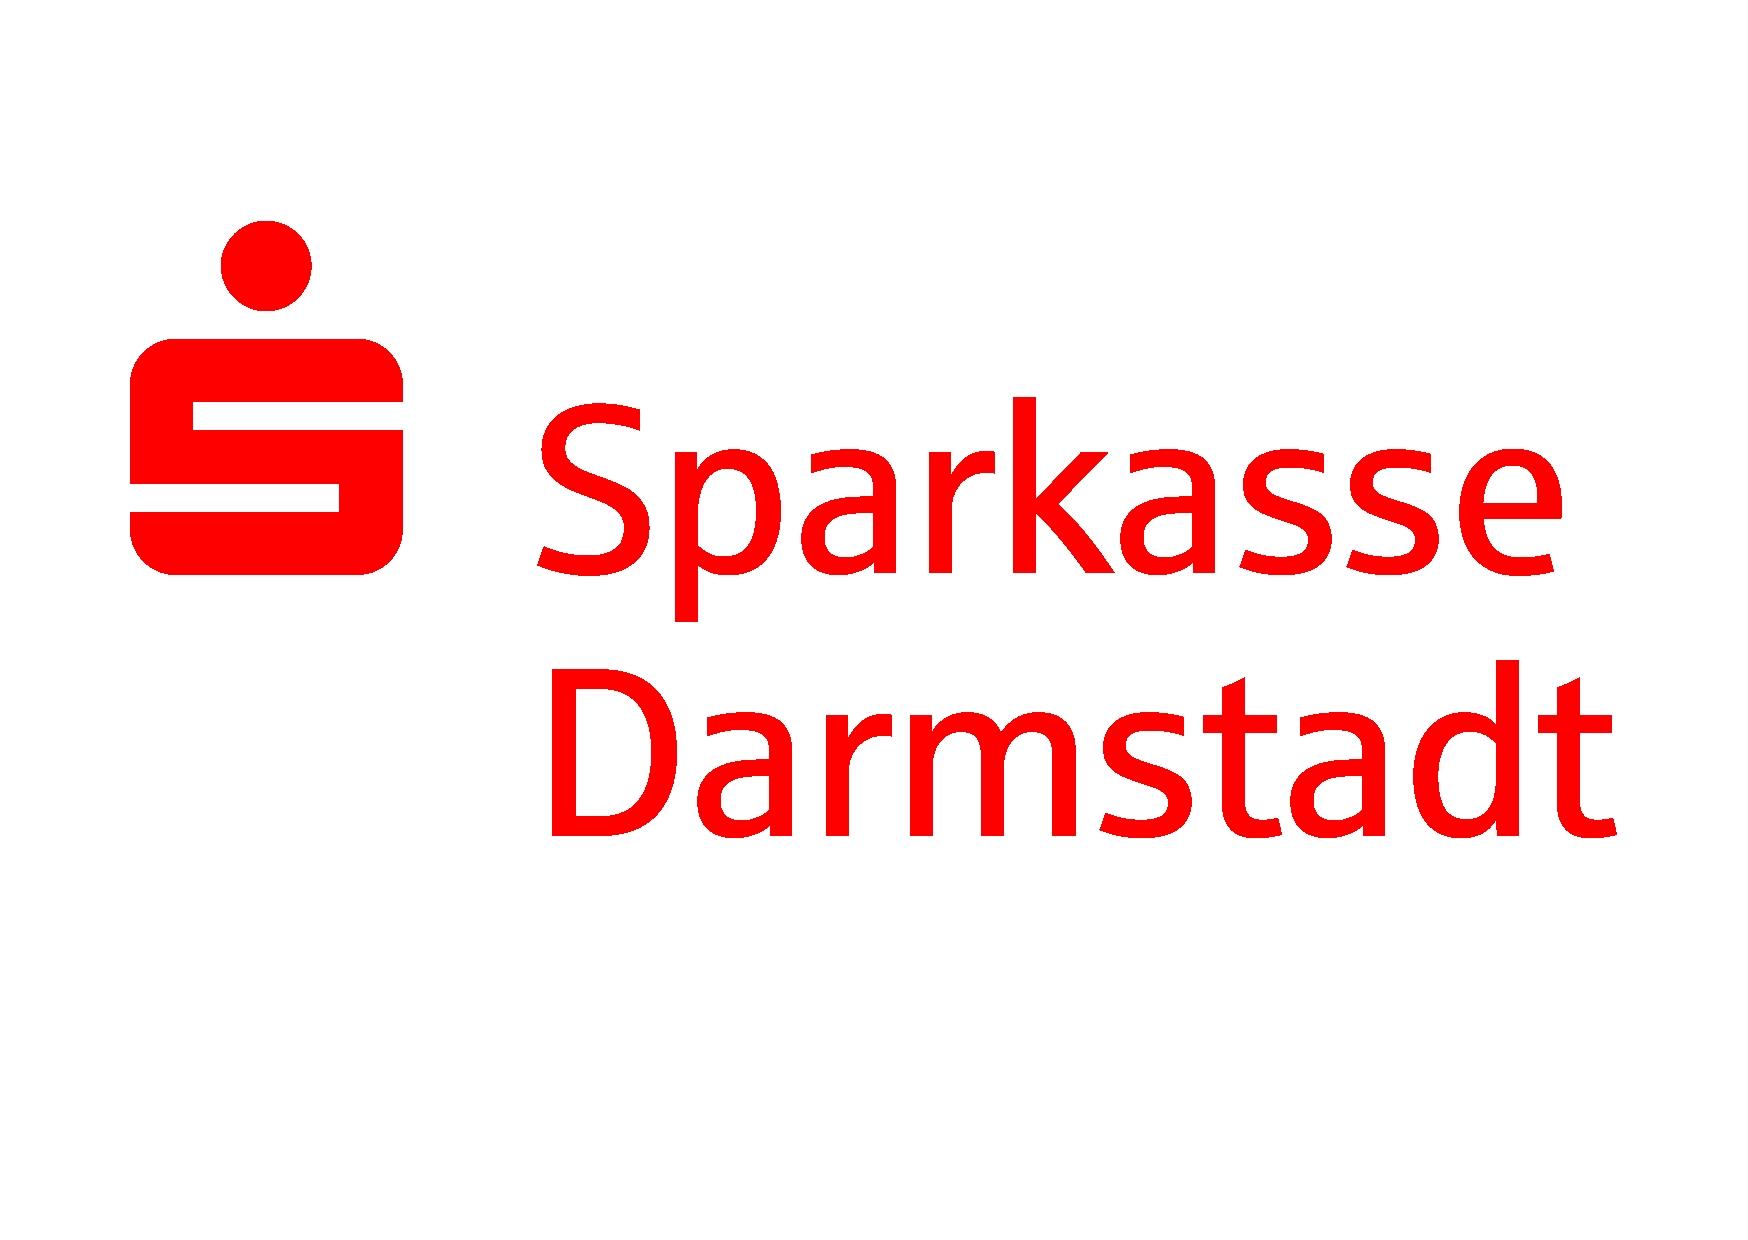 Sparkasse Darmstadt & Sparkassen-Kulturstiftung Hessen-Thüringen